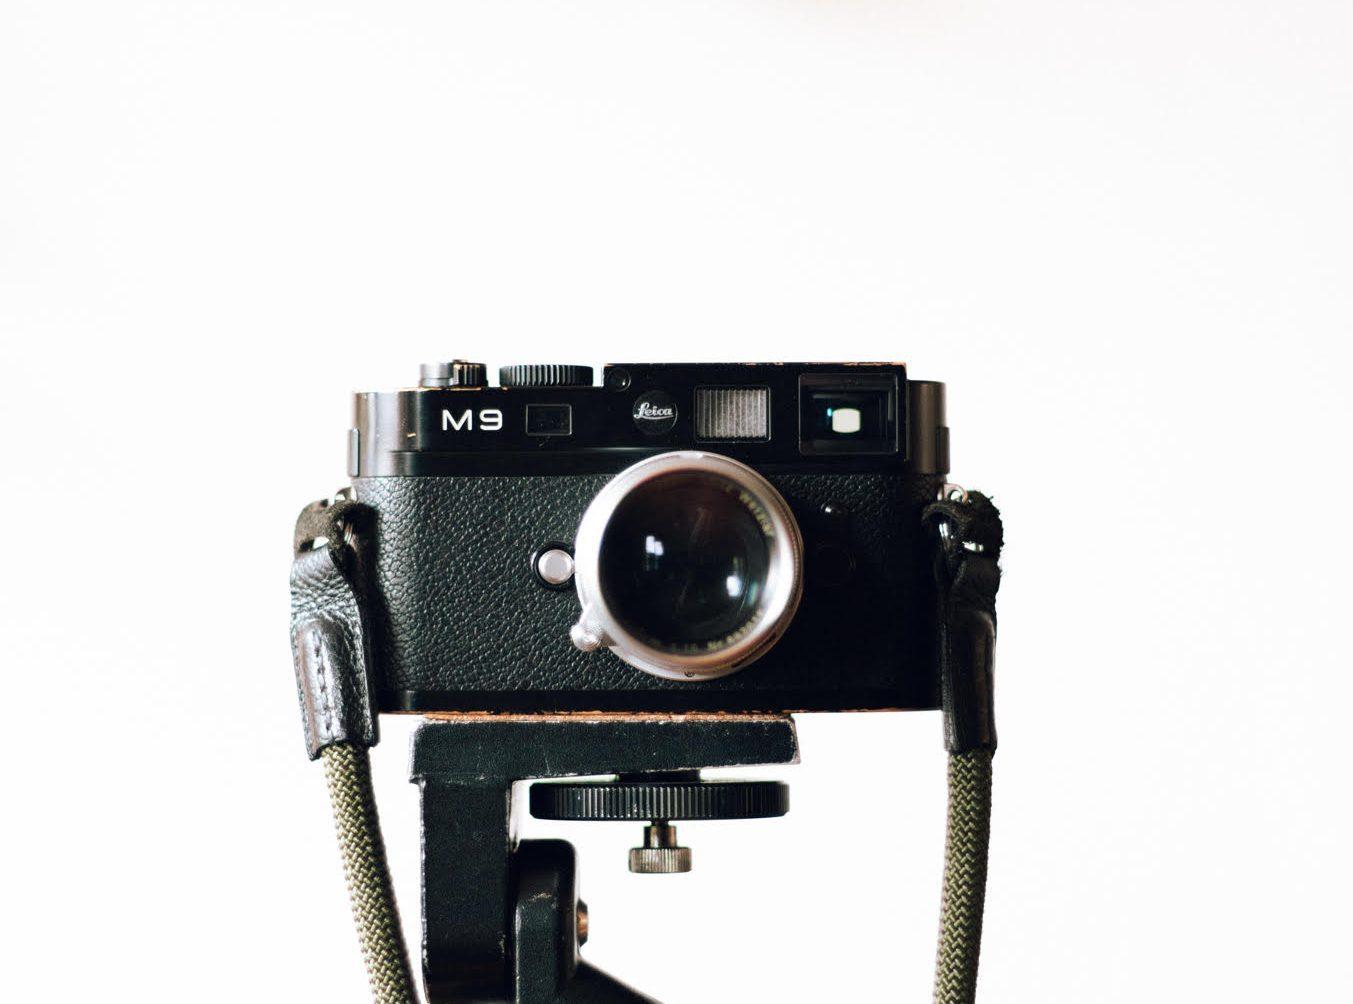 【Leica】今、M9という選択